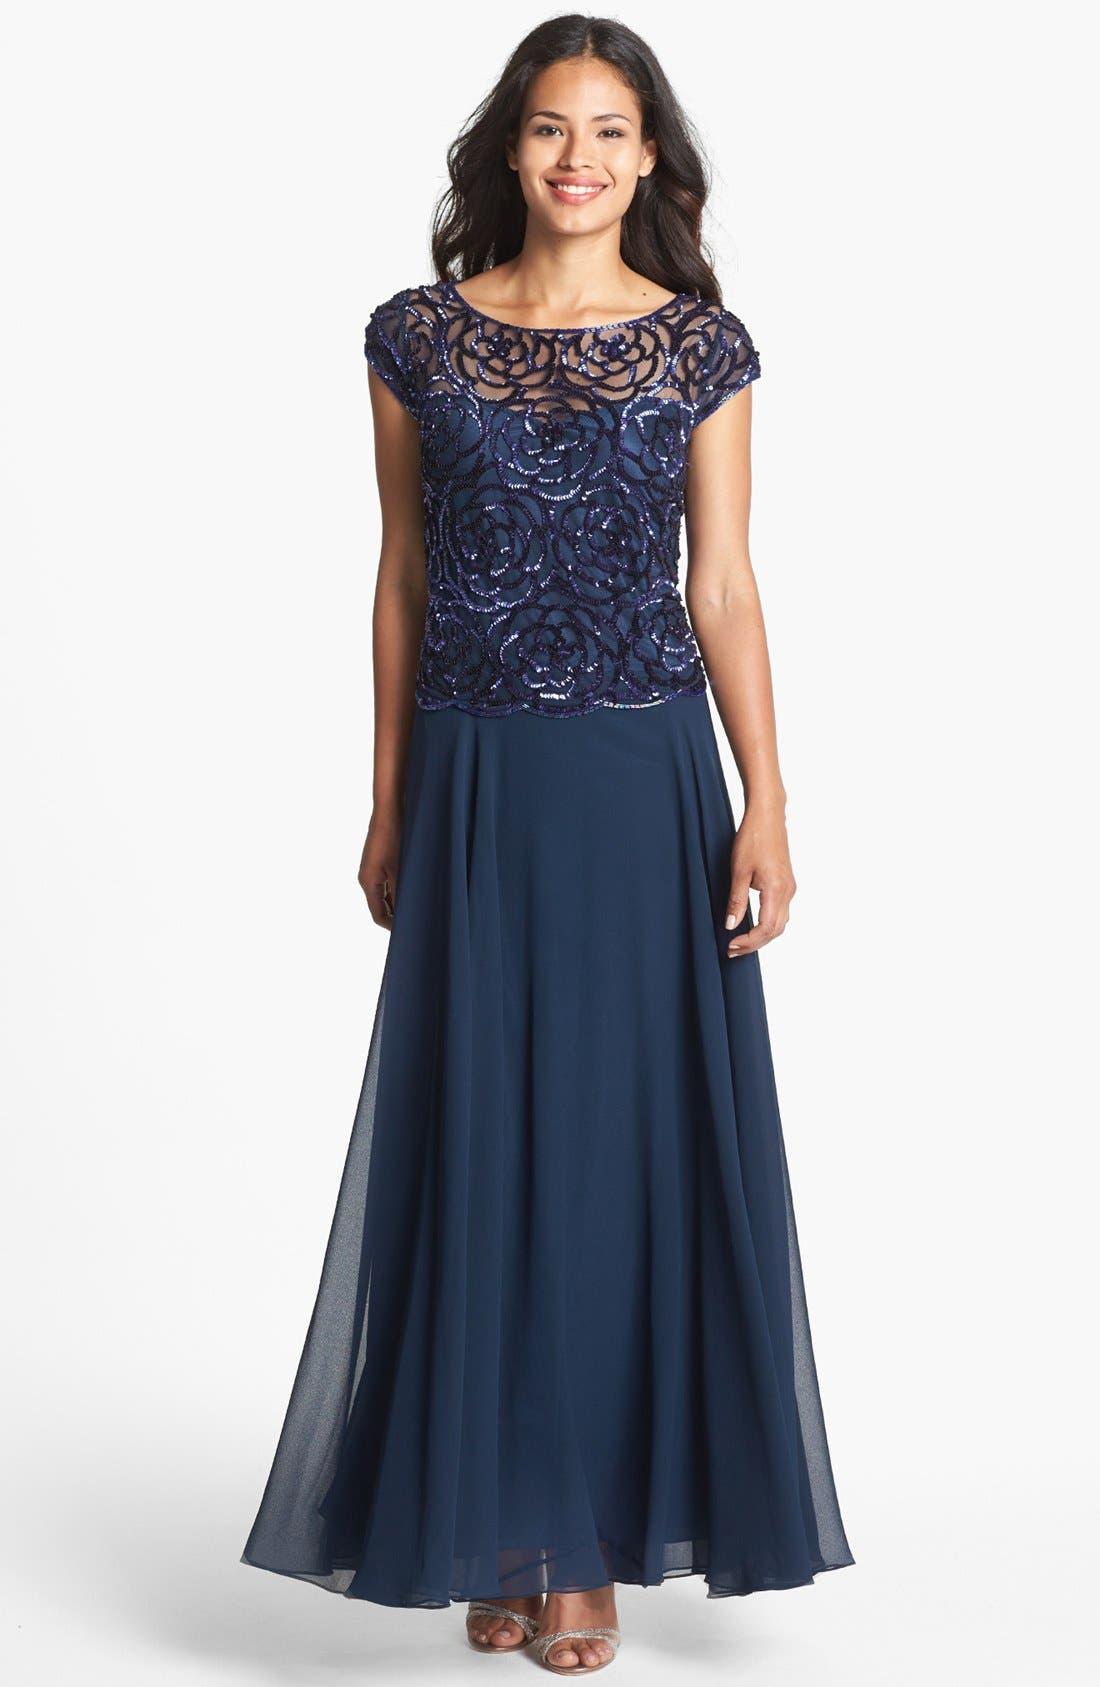 Main Image - J Kara Sequin Floral Cap Sleeve Gown